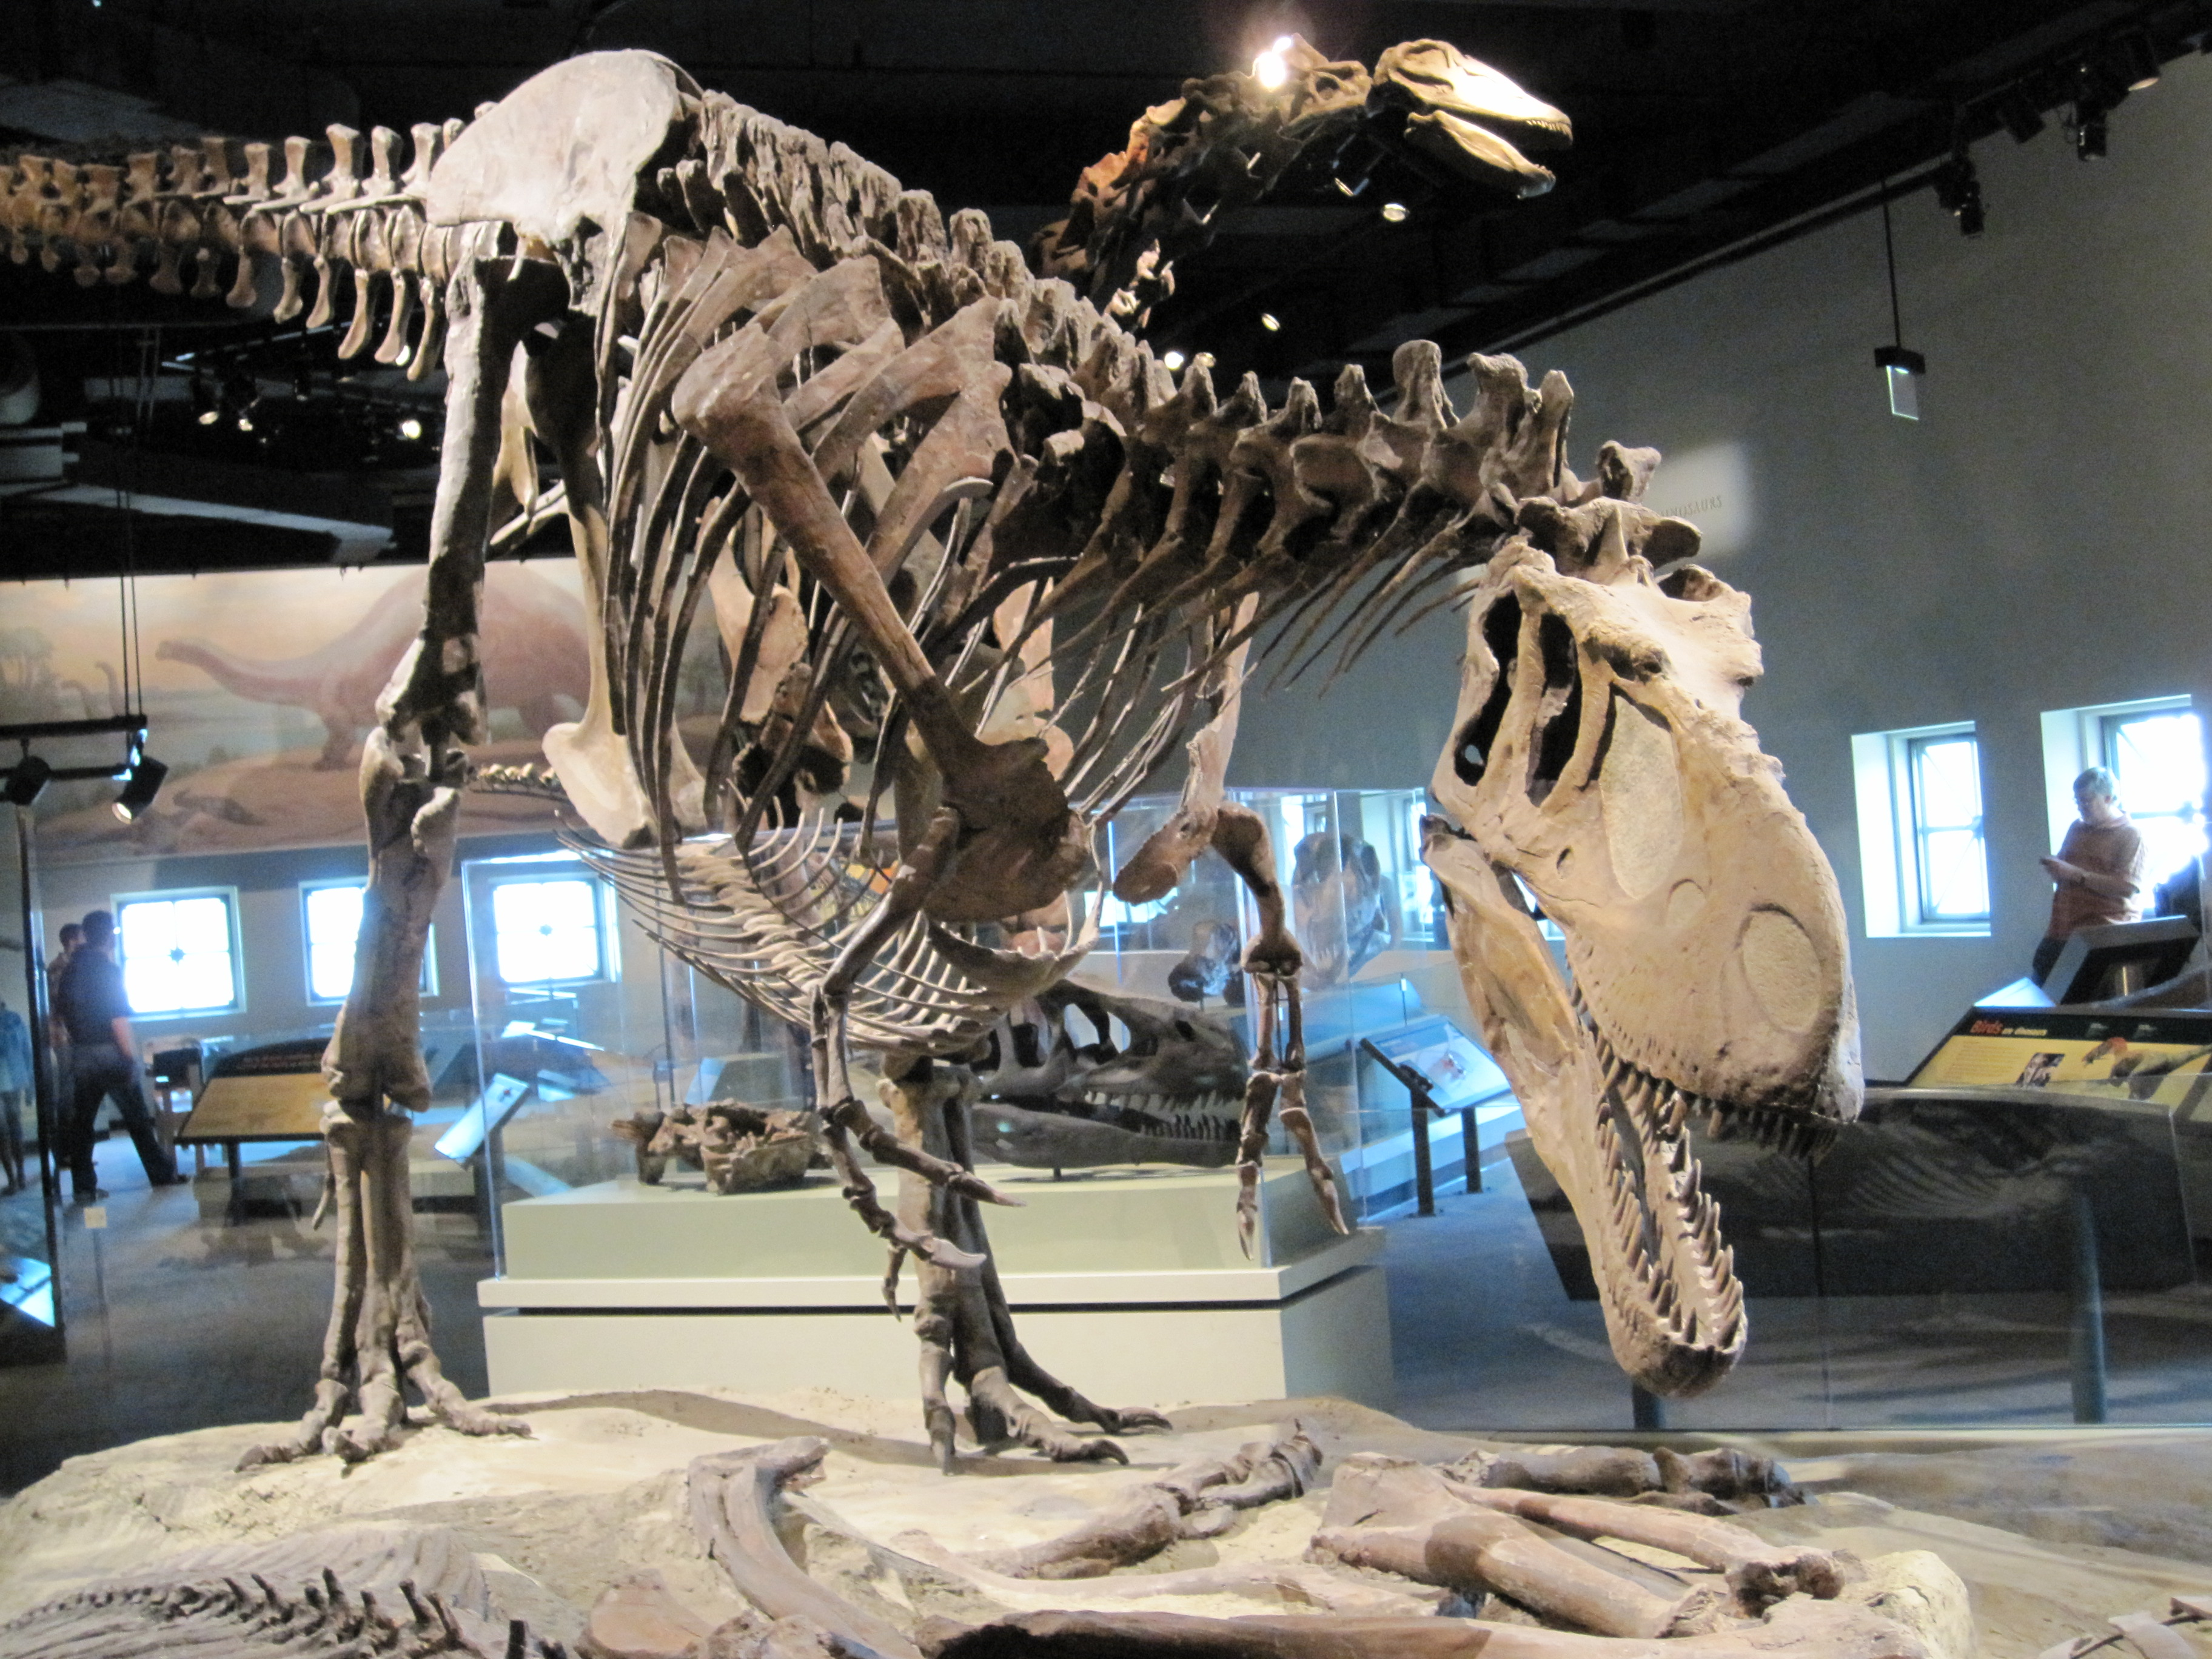 File:Daspletosaurus - front.JPG - Wikipedia